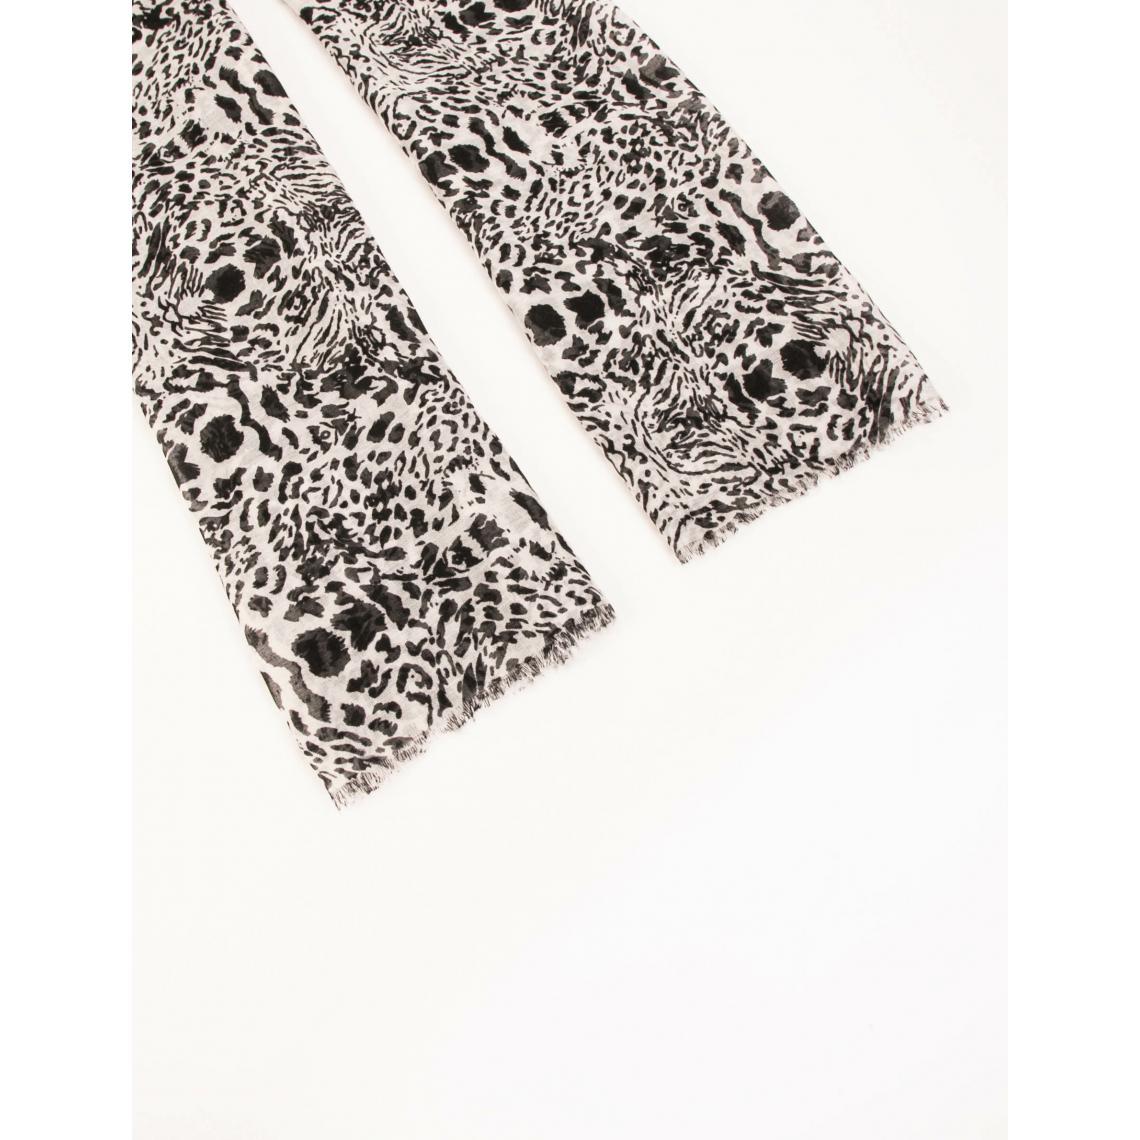 Foulard avec imprimé animalier